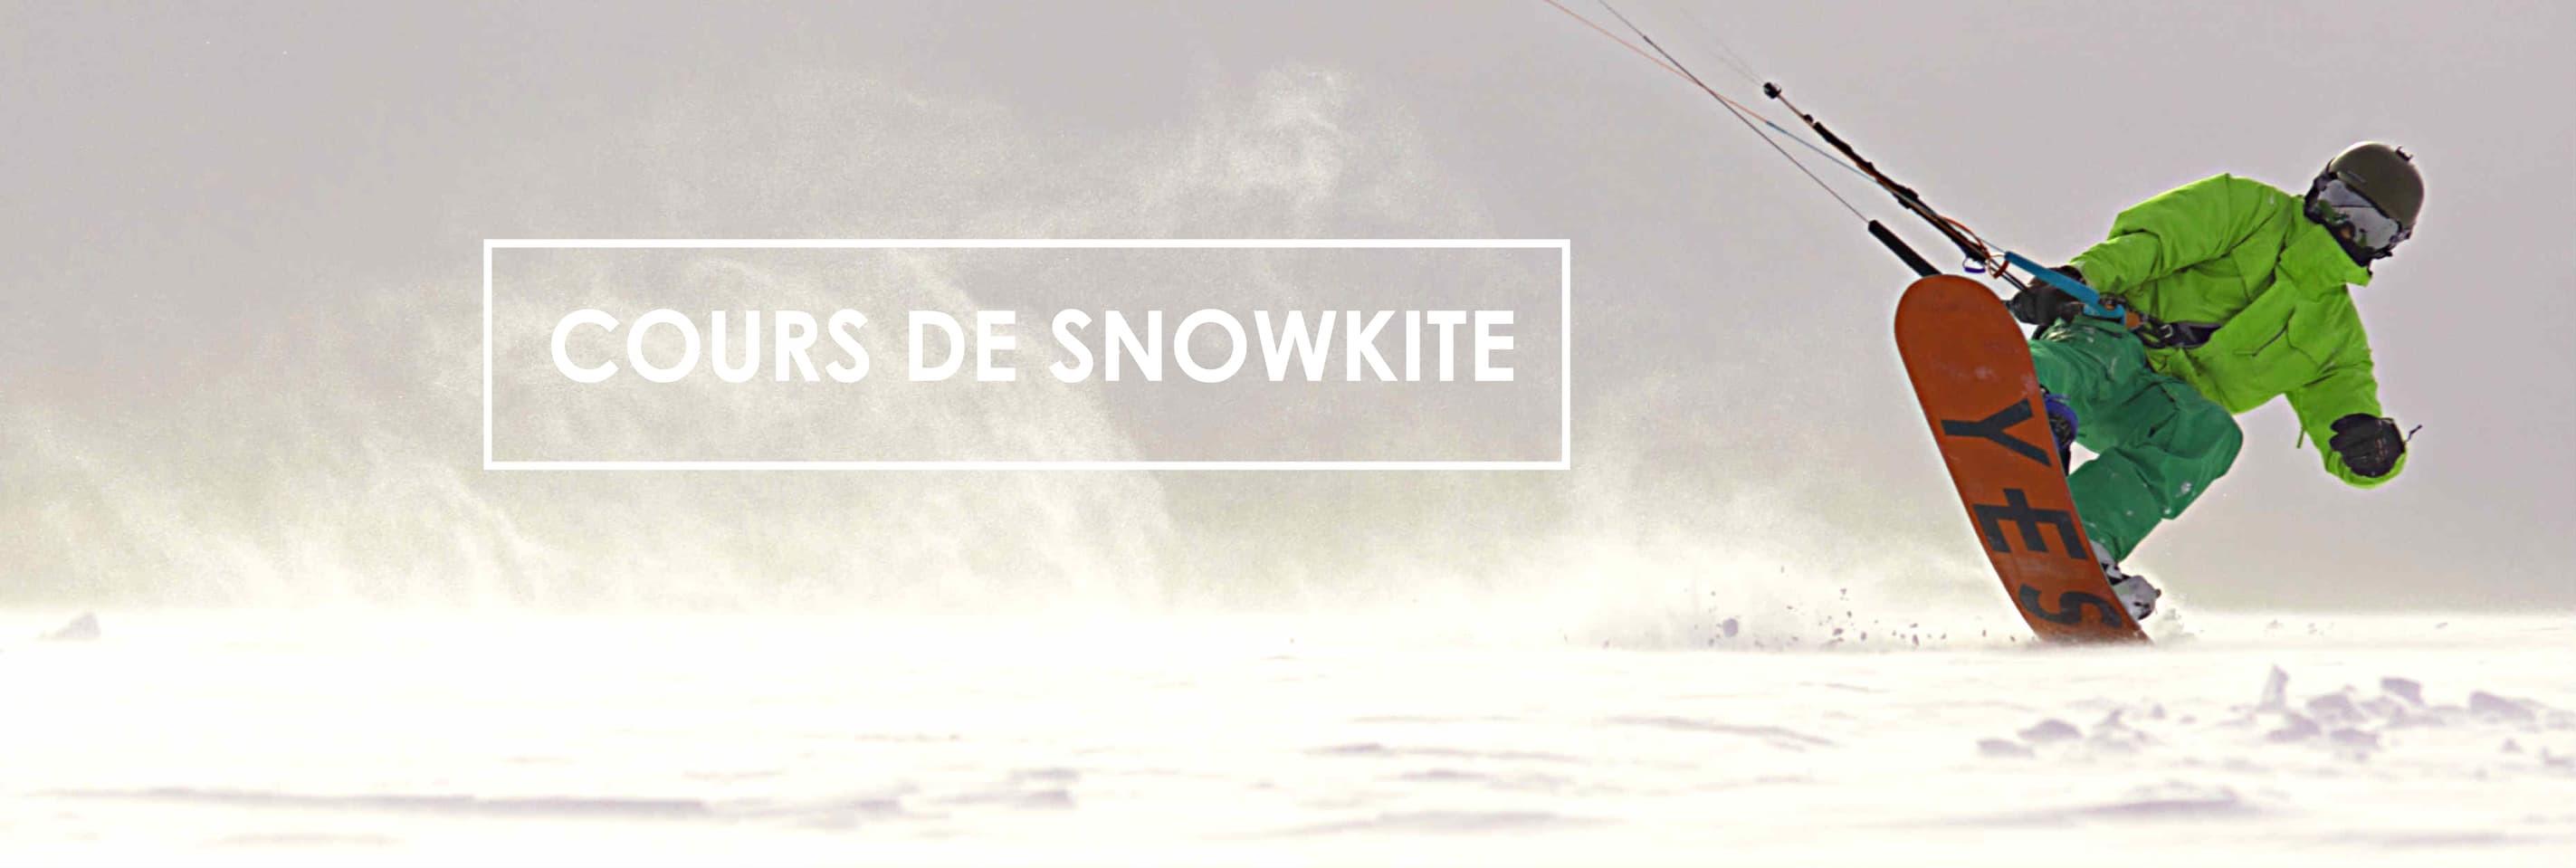 Cours de Snowkite